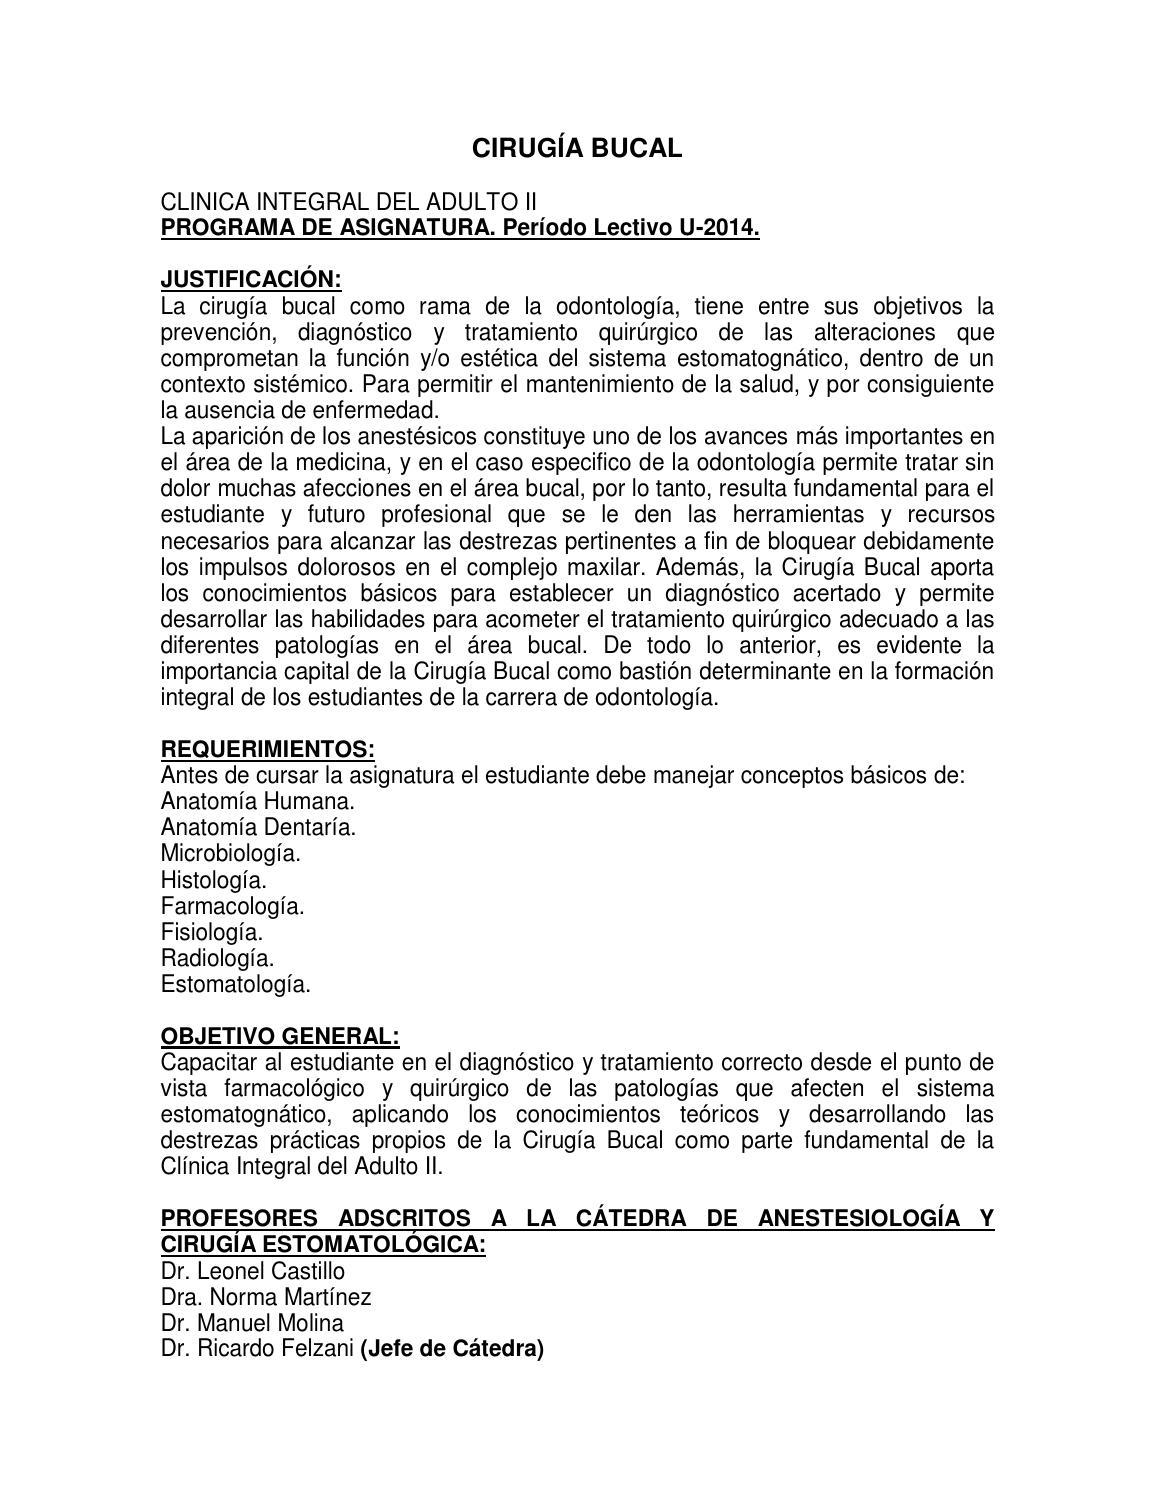 Programa cirugia CIA II periodo U 2014. by Genesis Albarran - issuu